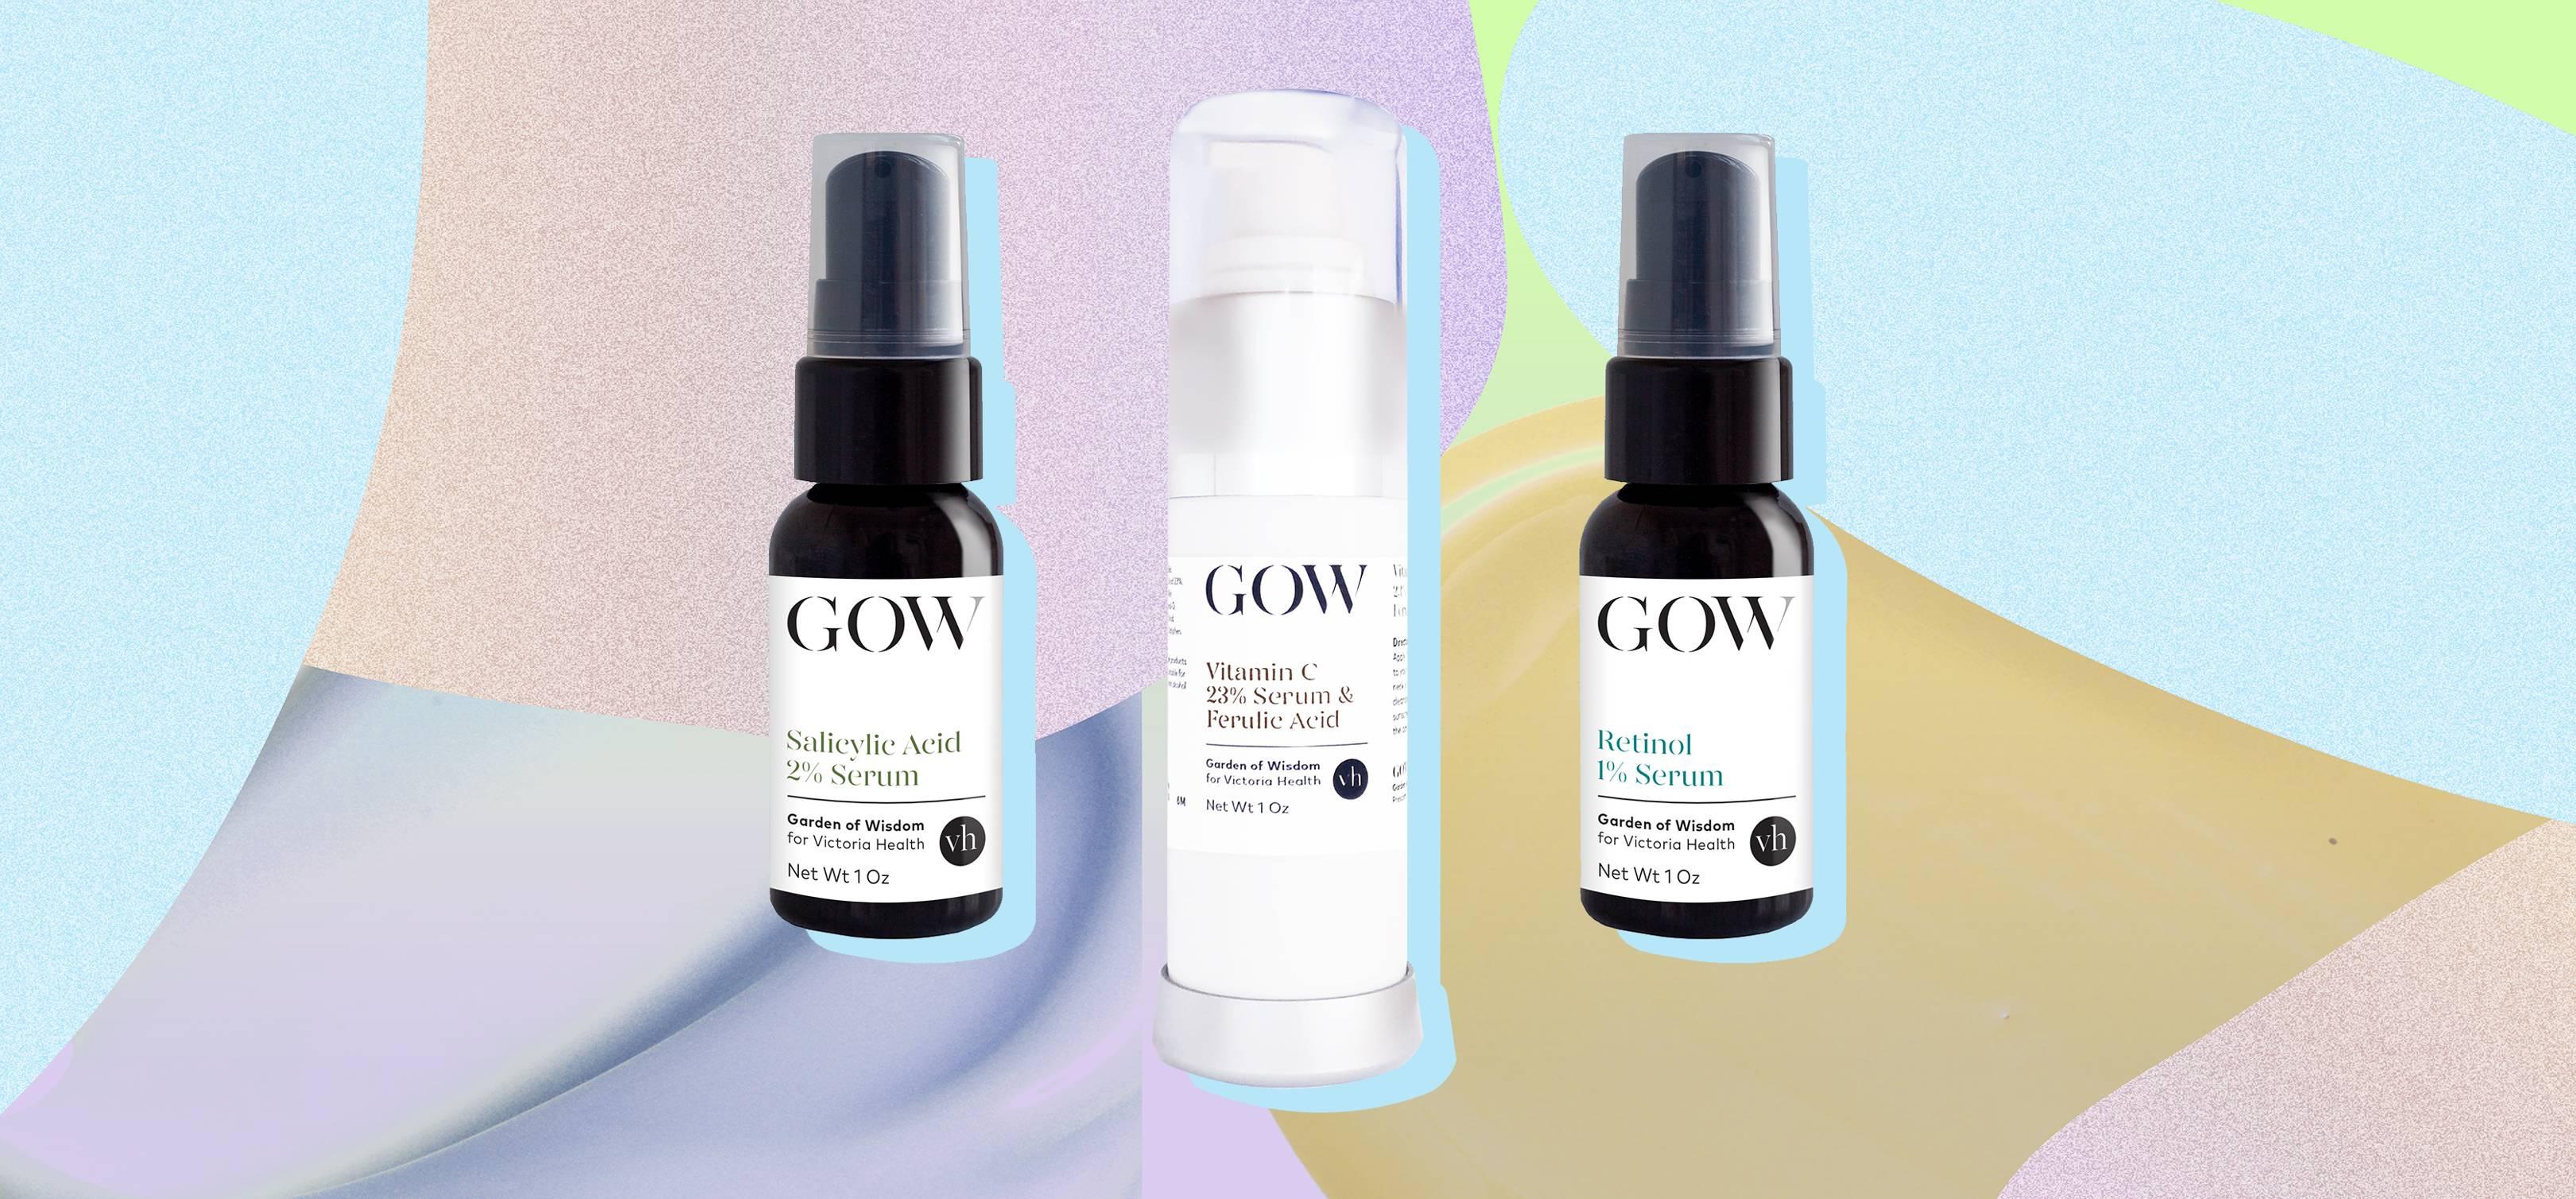 Garden Of Wisdom Skincare Brand Has Rave Reviews | Glamour UK